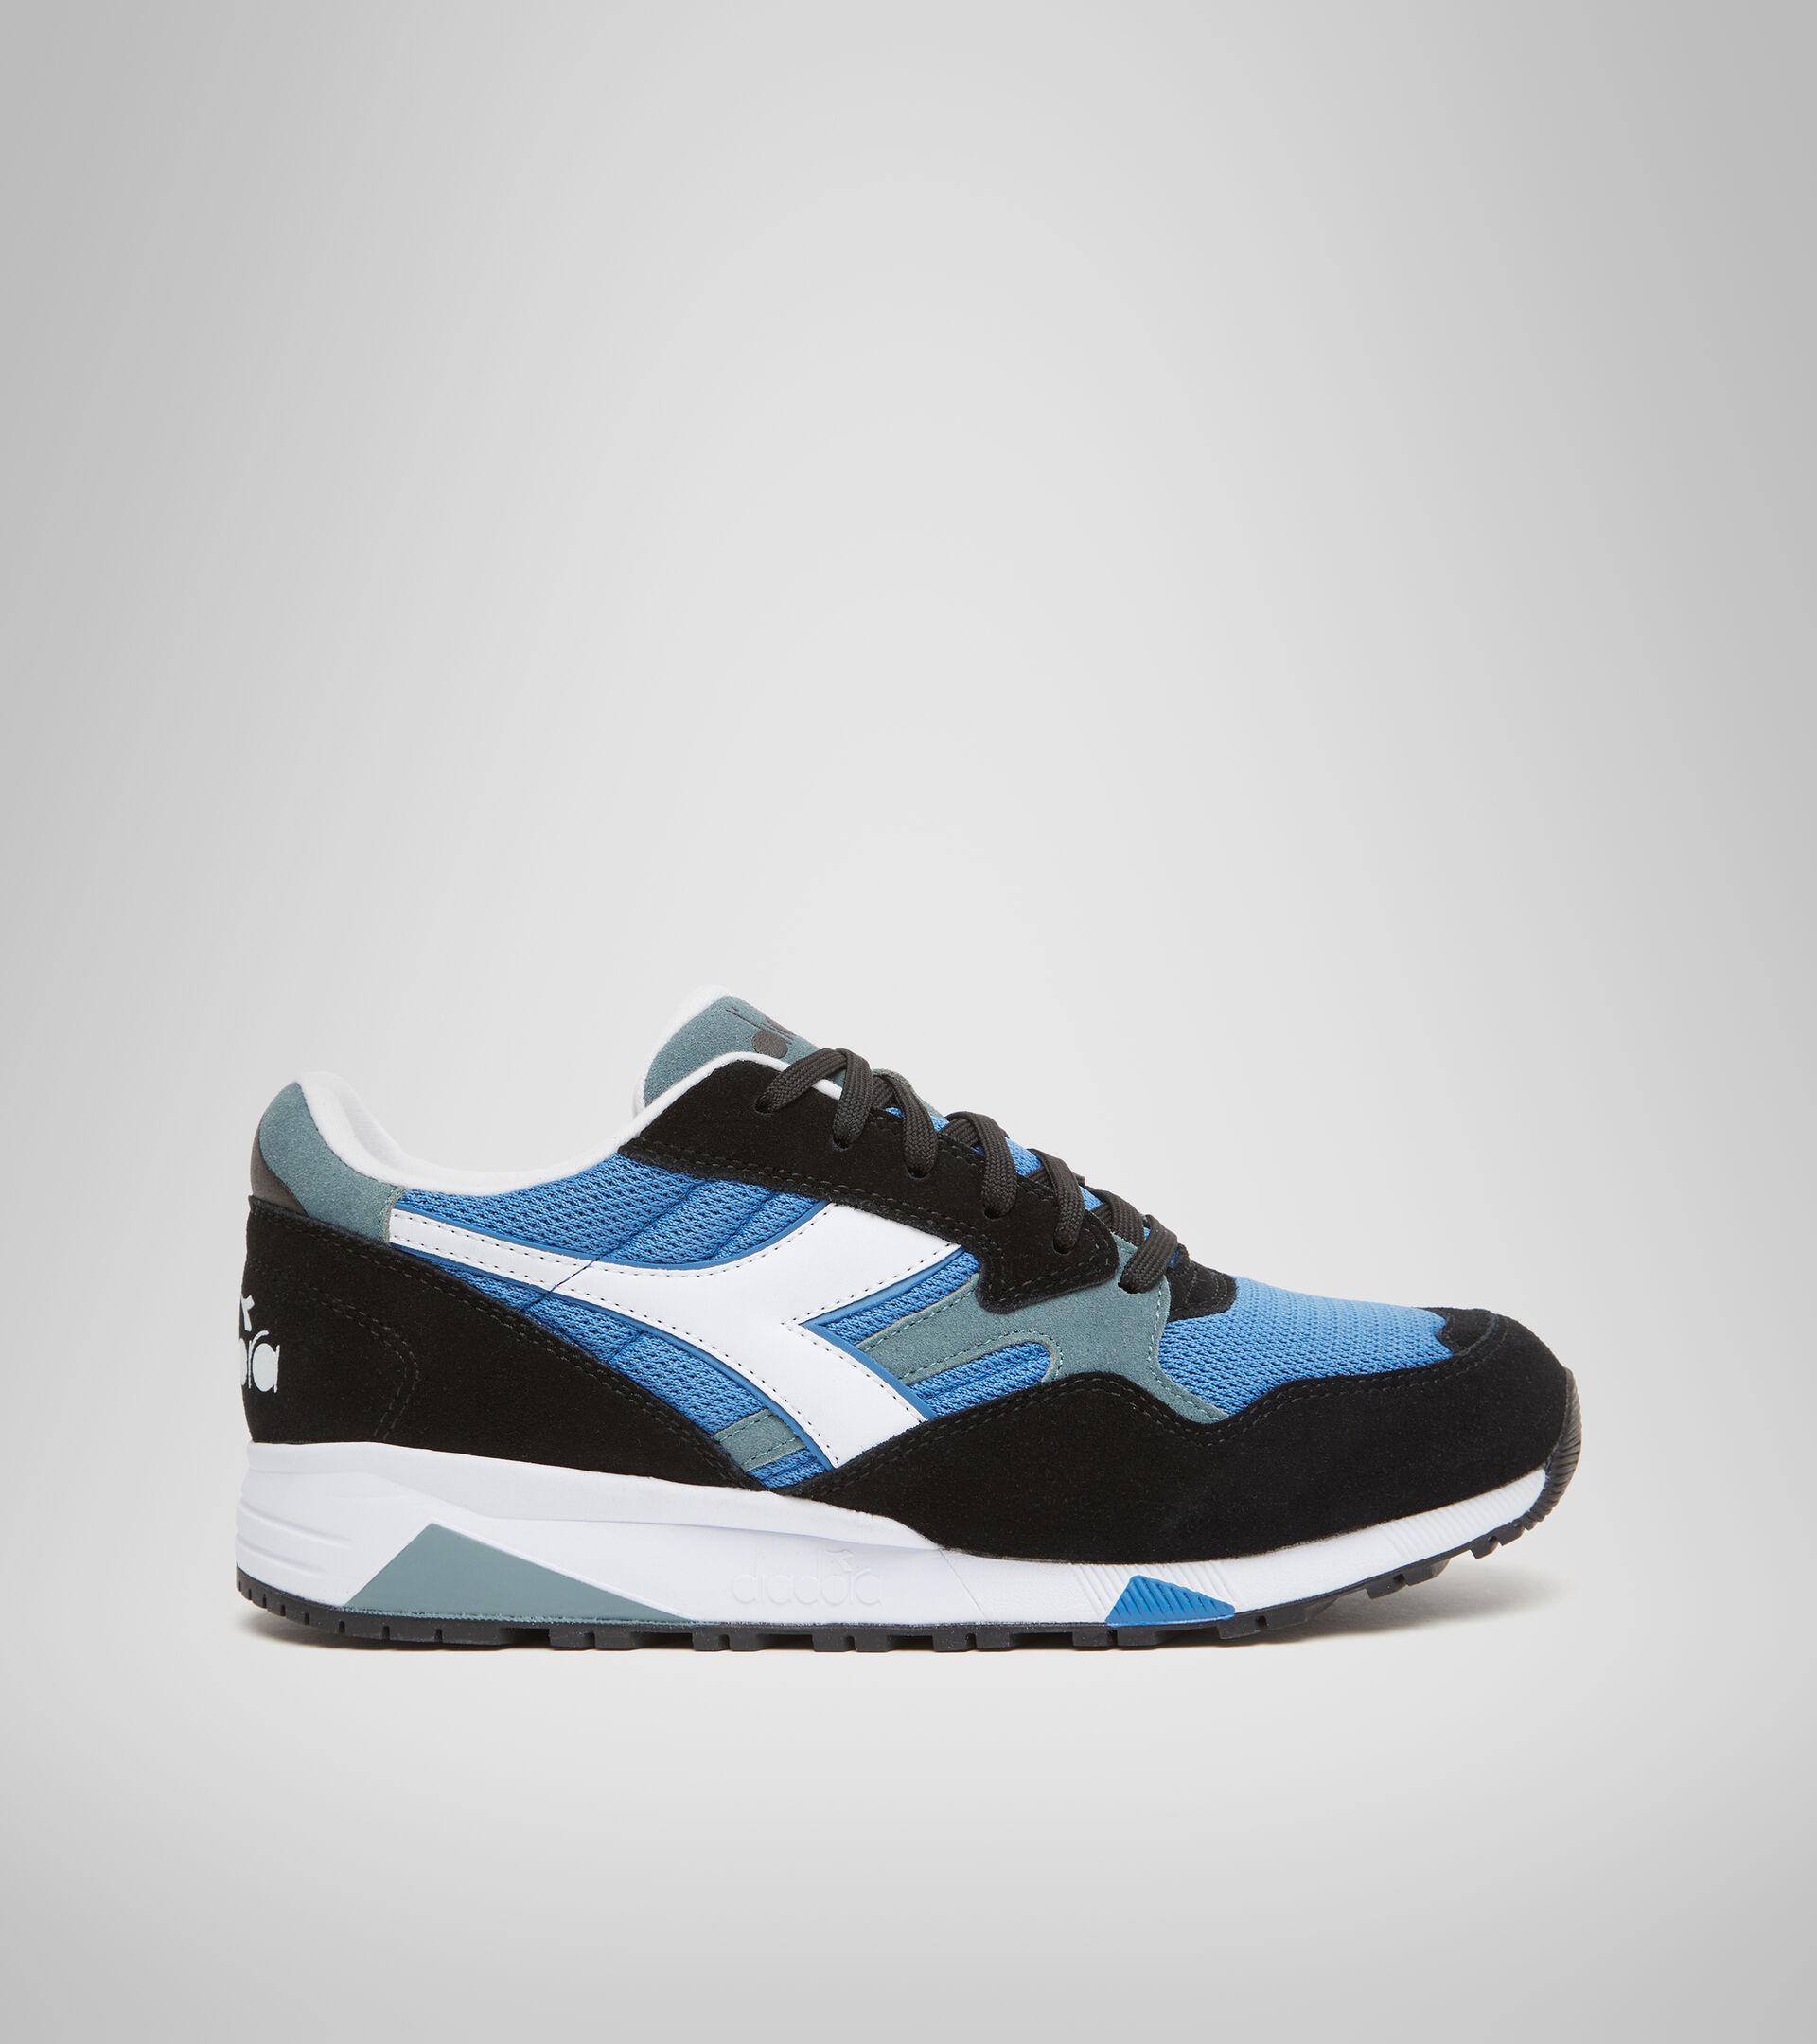 Footwear Sportswear UNISEX N902 S AZUL VALLARTA/NEGRO Diadora